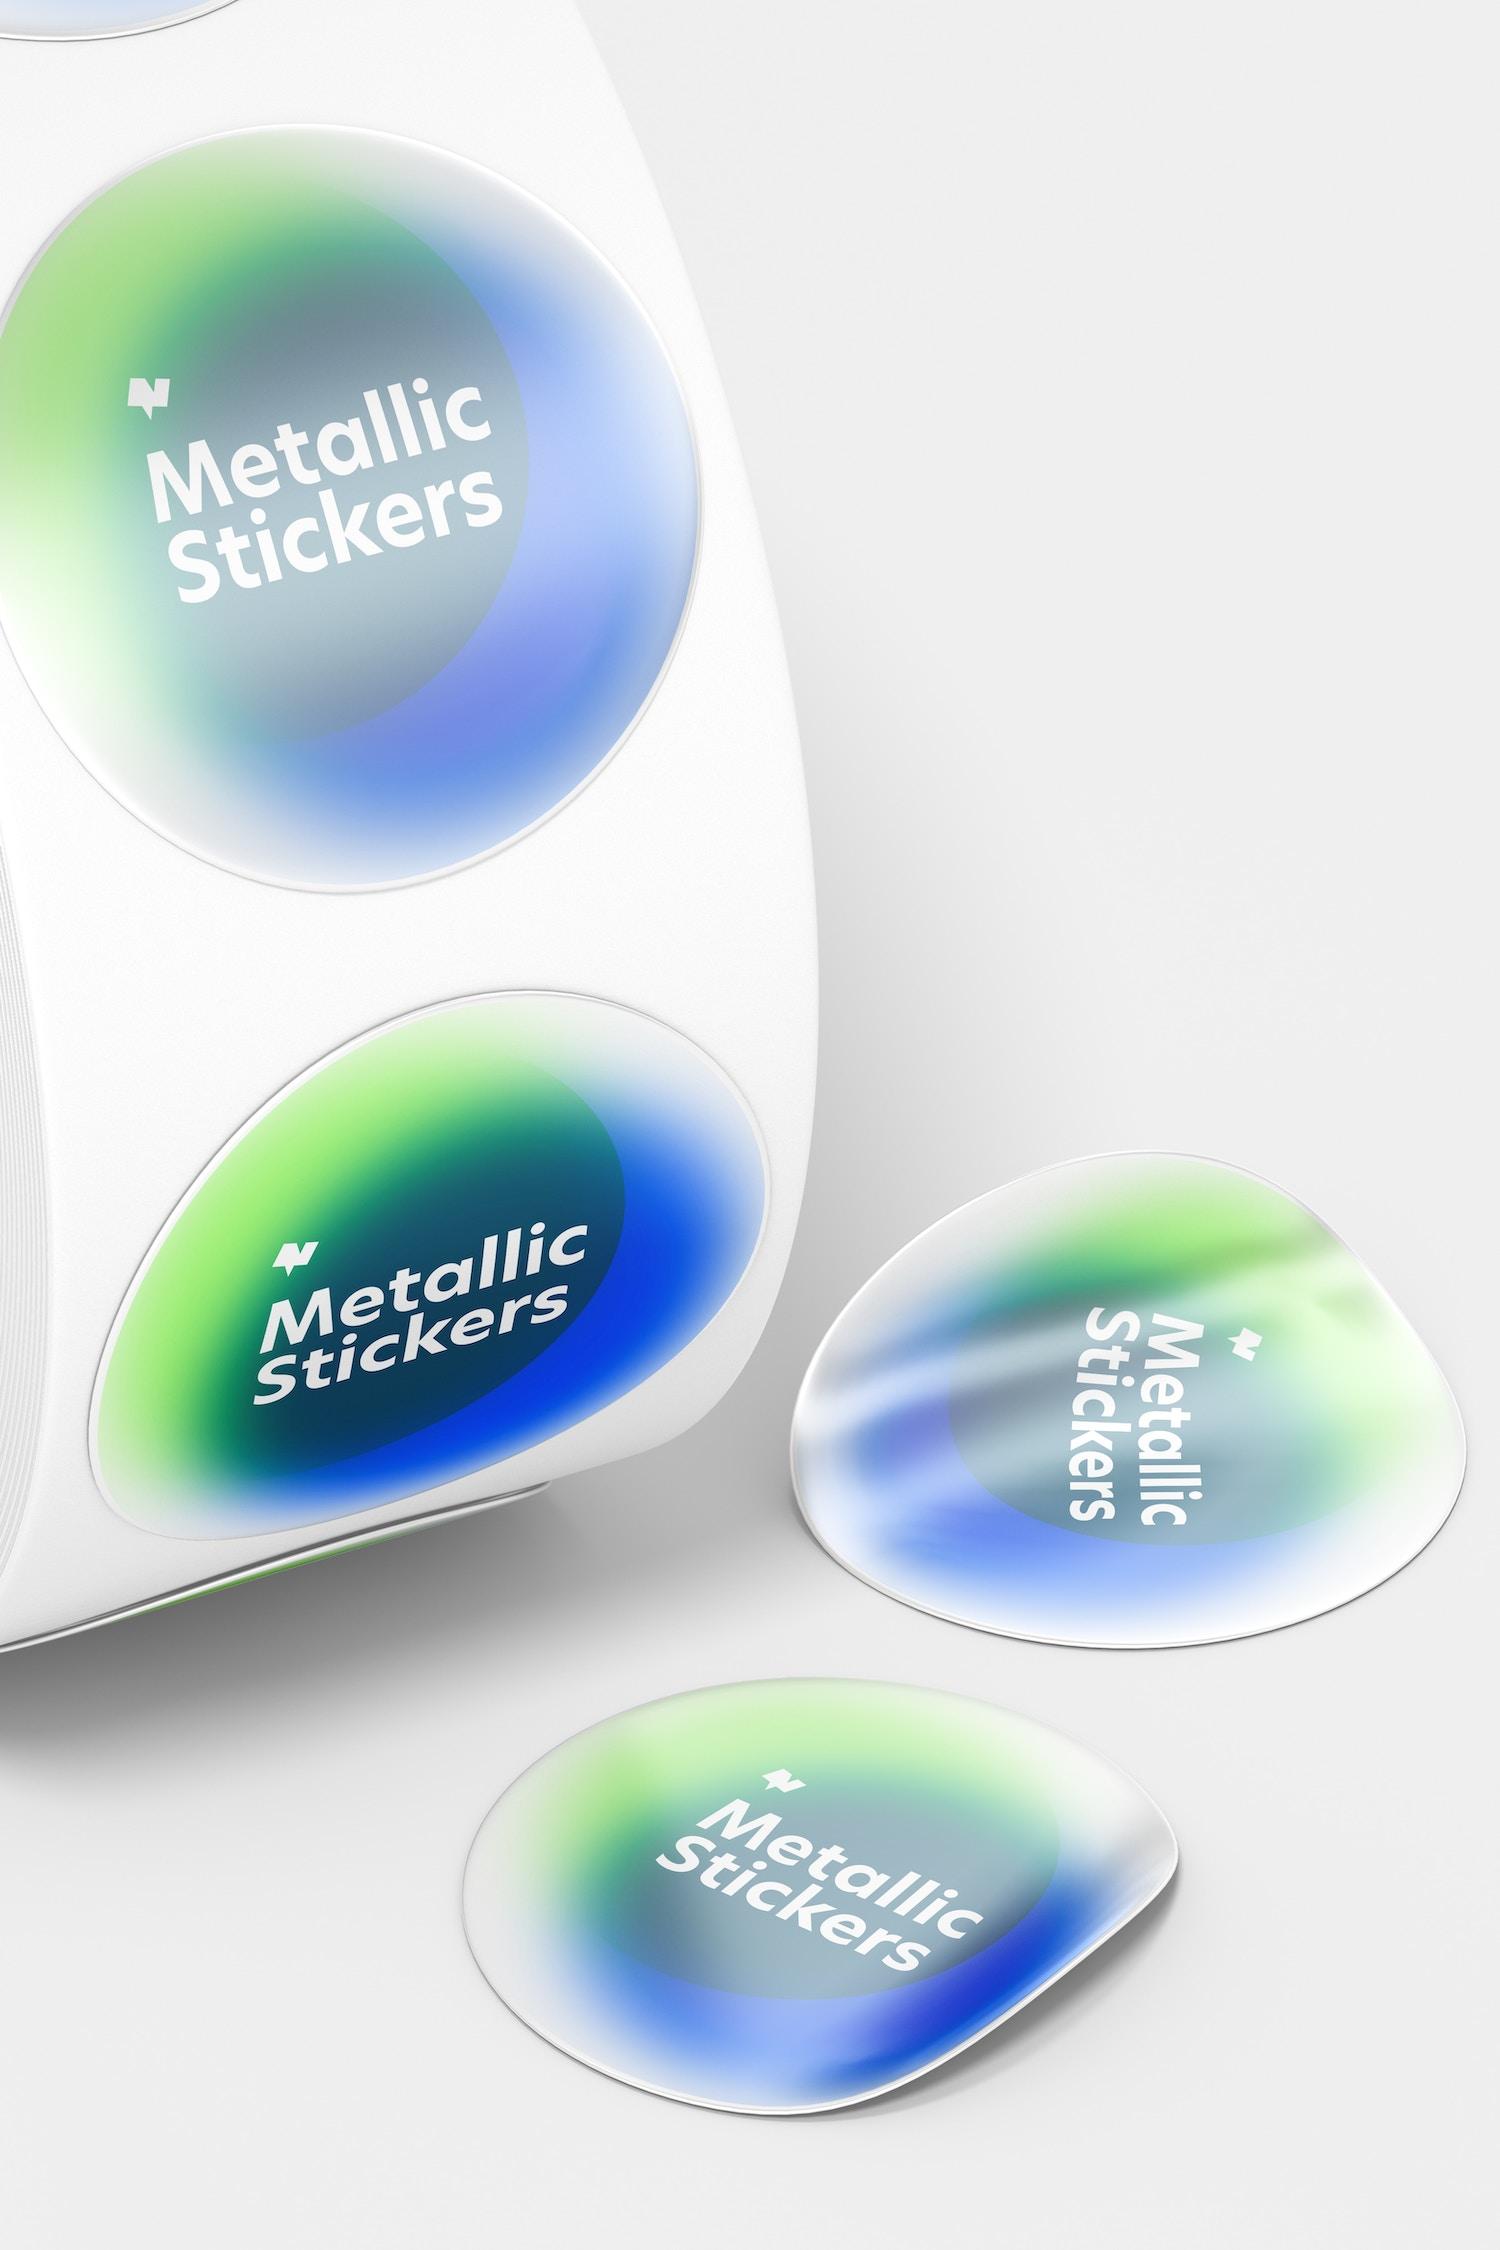 Metallic Stickers Roll Mockup, Close Up